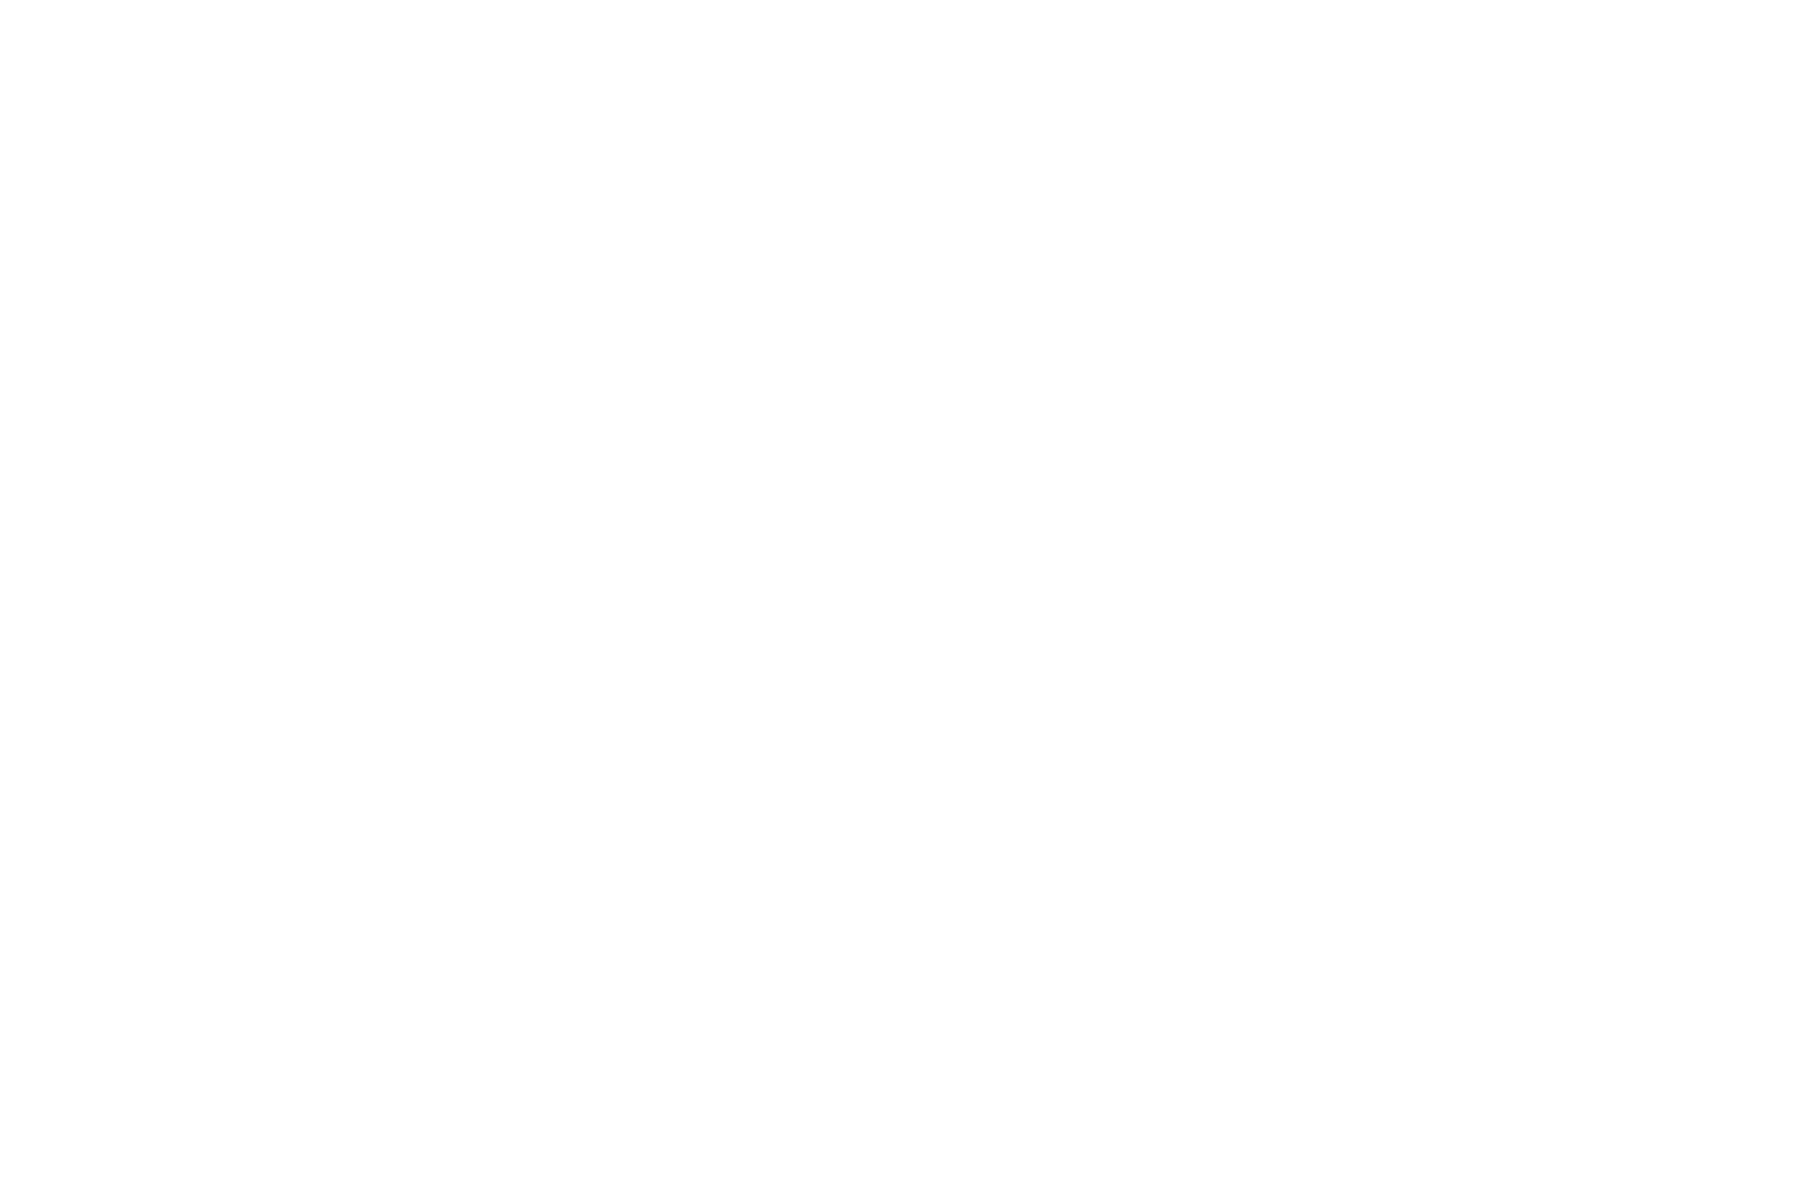 orgreen-logowht.jpg